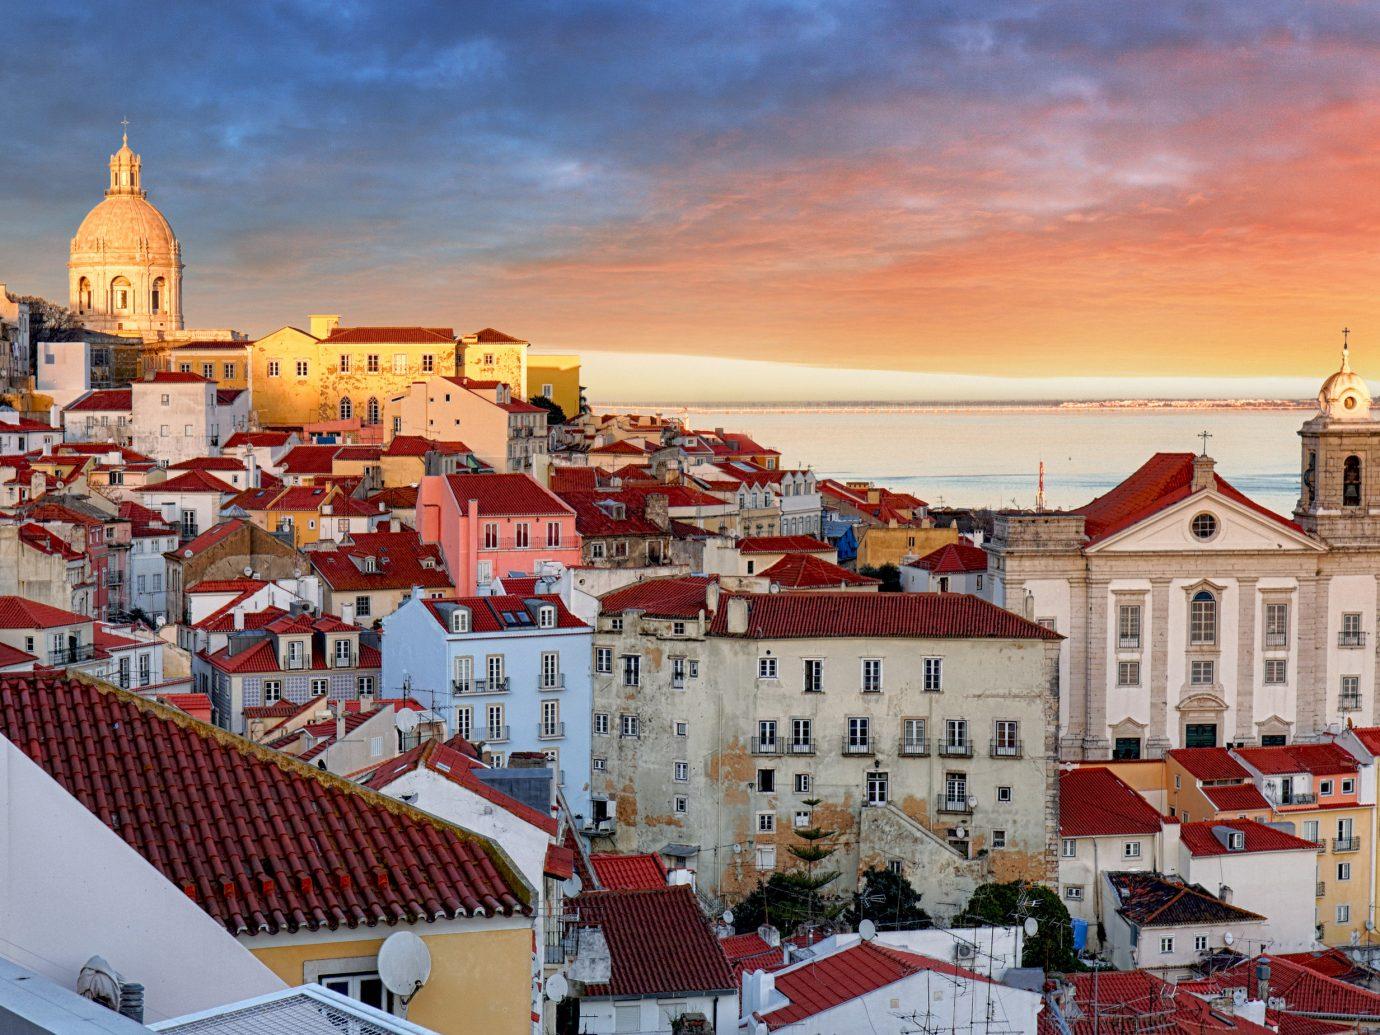 Hotels Trip Ideas outdoor Town landmark City human settlement cityscape vacation tourism skyline